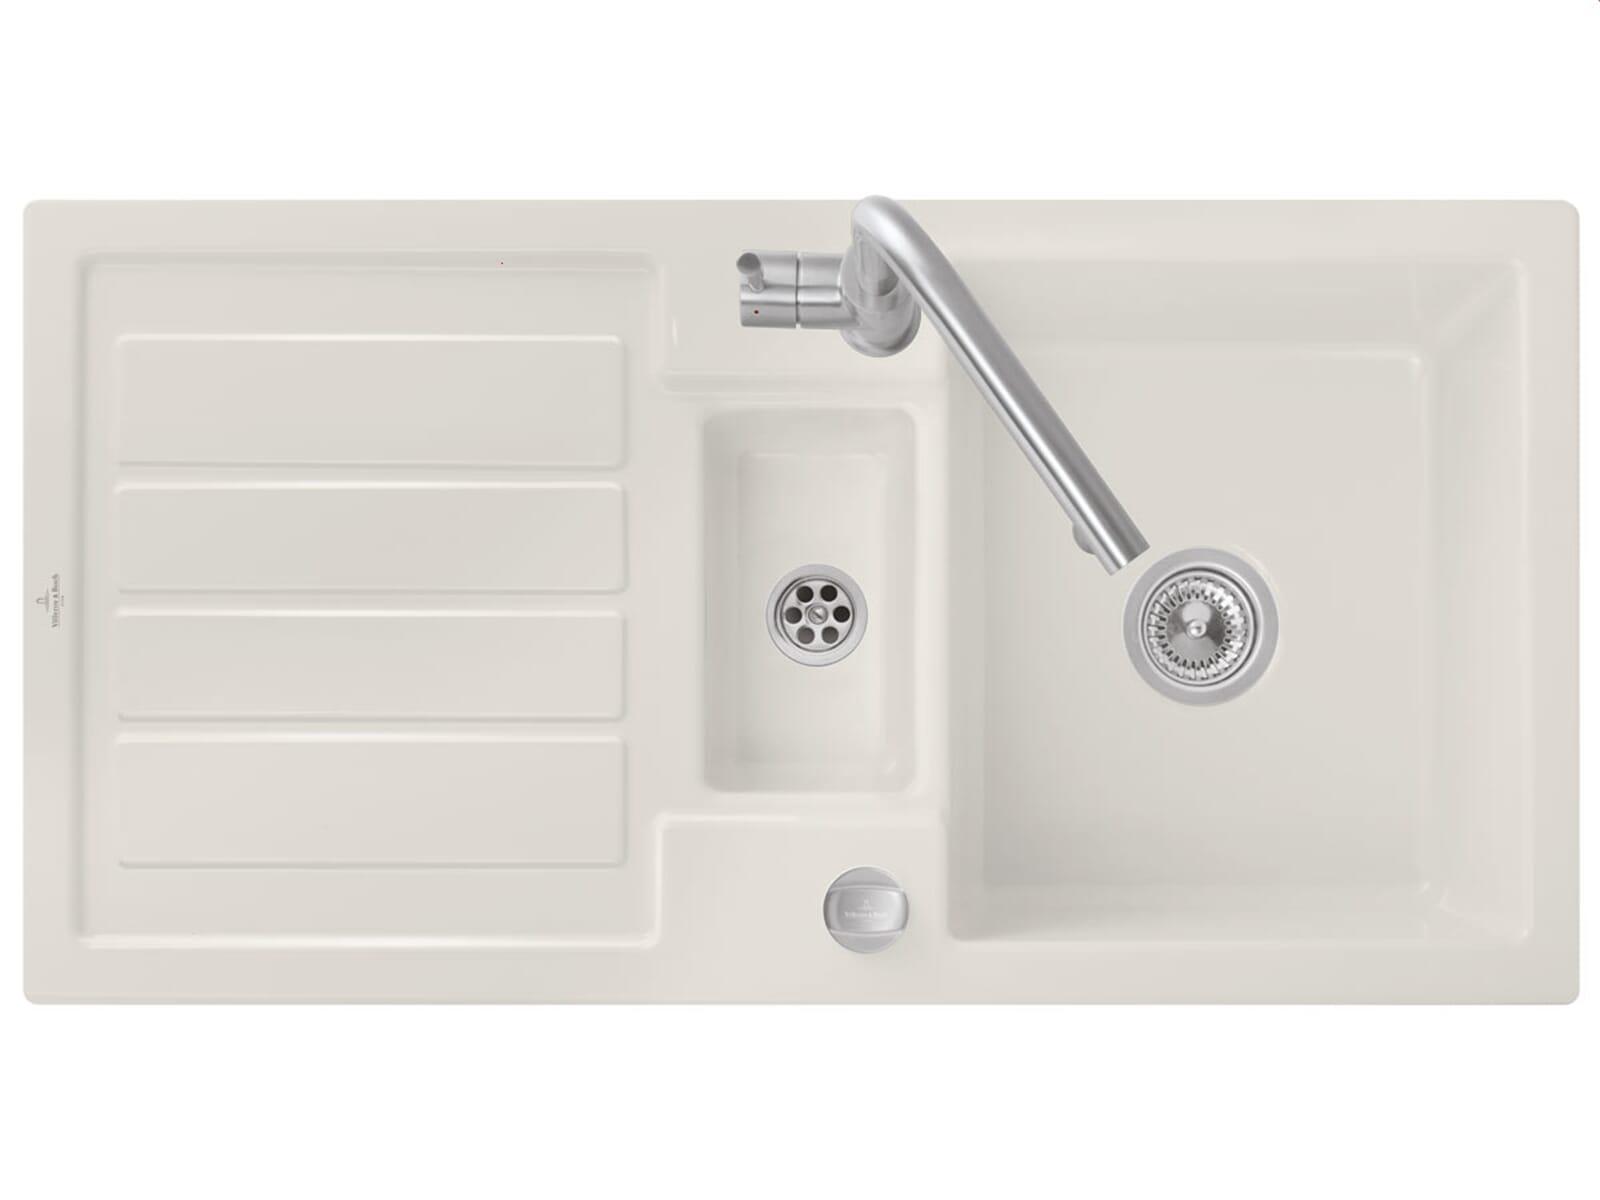 villeroy boch flavia 60 crema beige sp le einbau. Black Bedroom Furniture Sets. Home Design Ideas